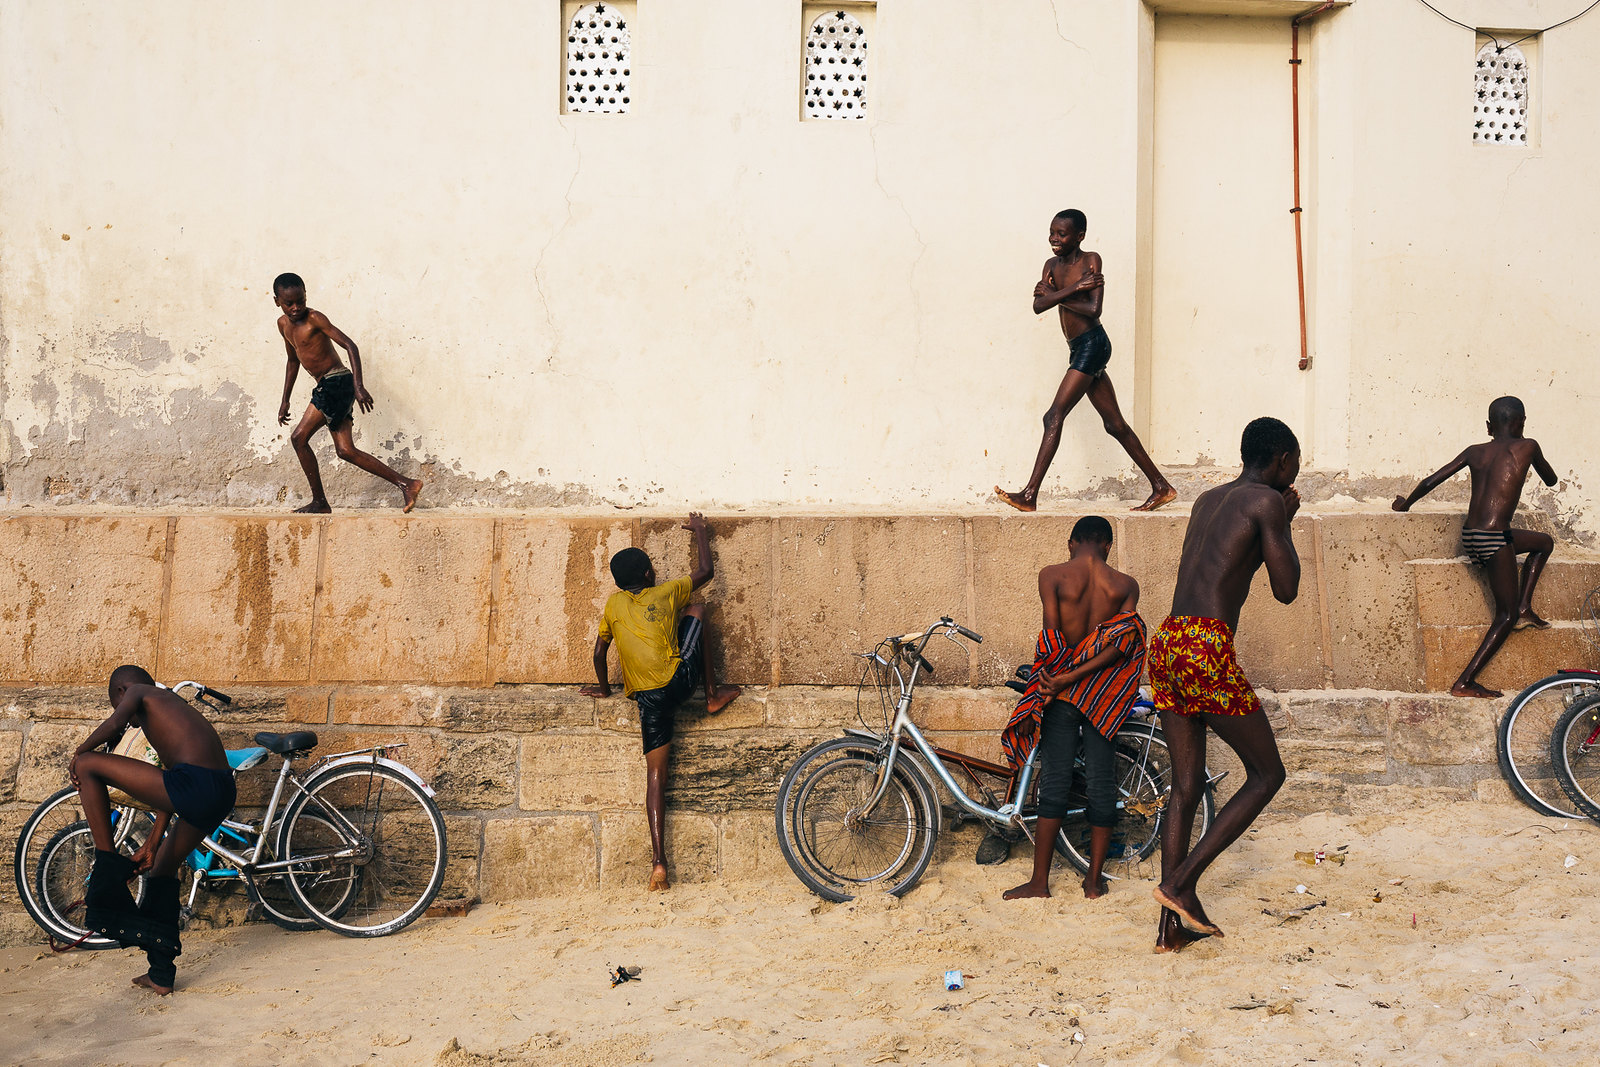 Zanzibar, 2017. | by Khalil Snaps